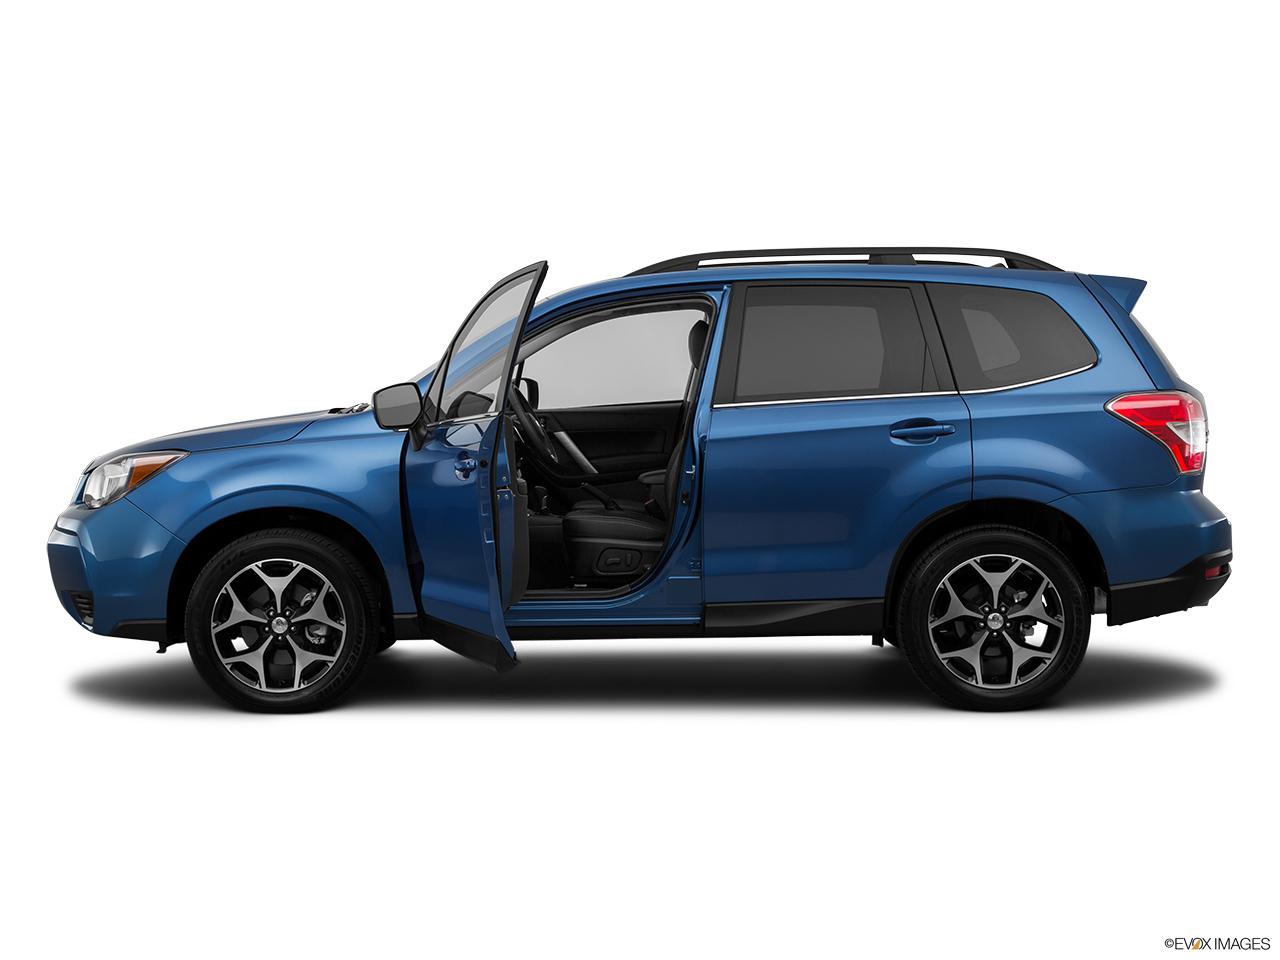 2015 subaru forester 2017 2018 best cars reviews. Black Bedroom Furniture Sets. Home Design Ideas